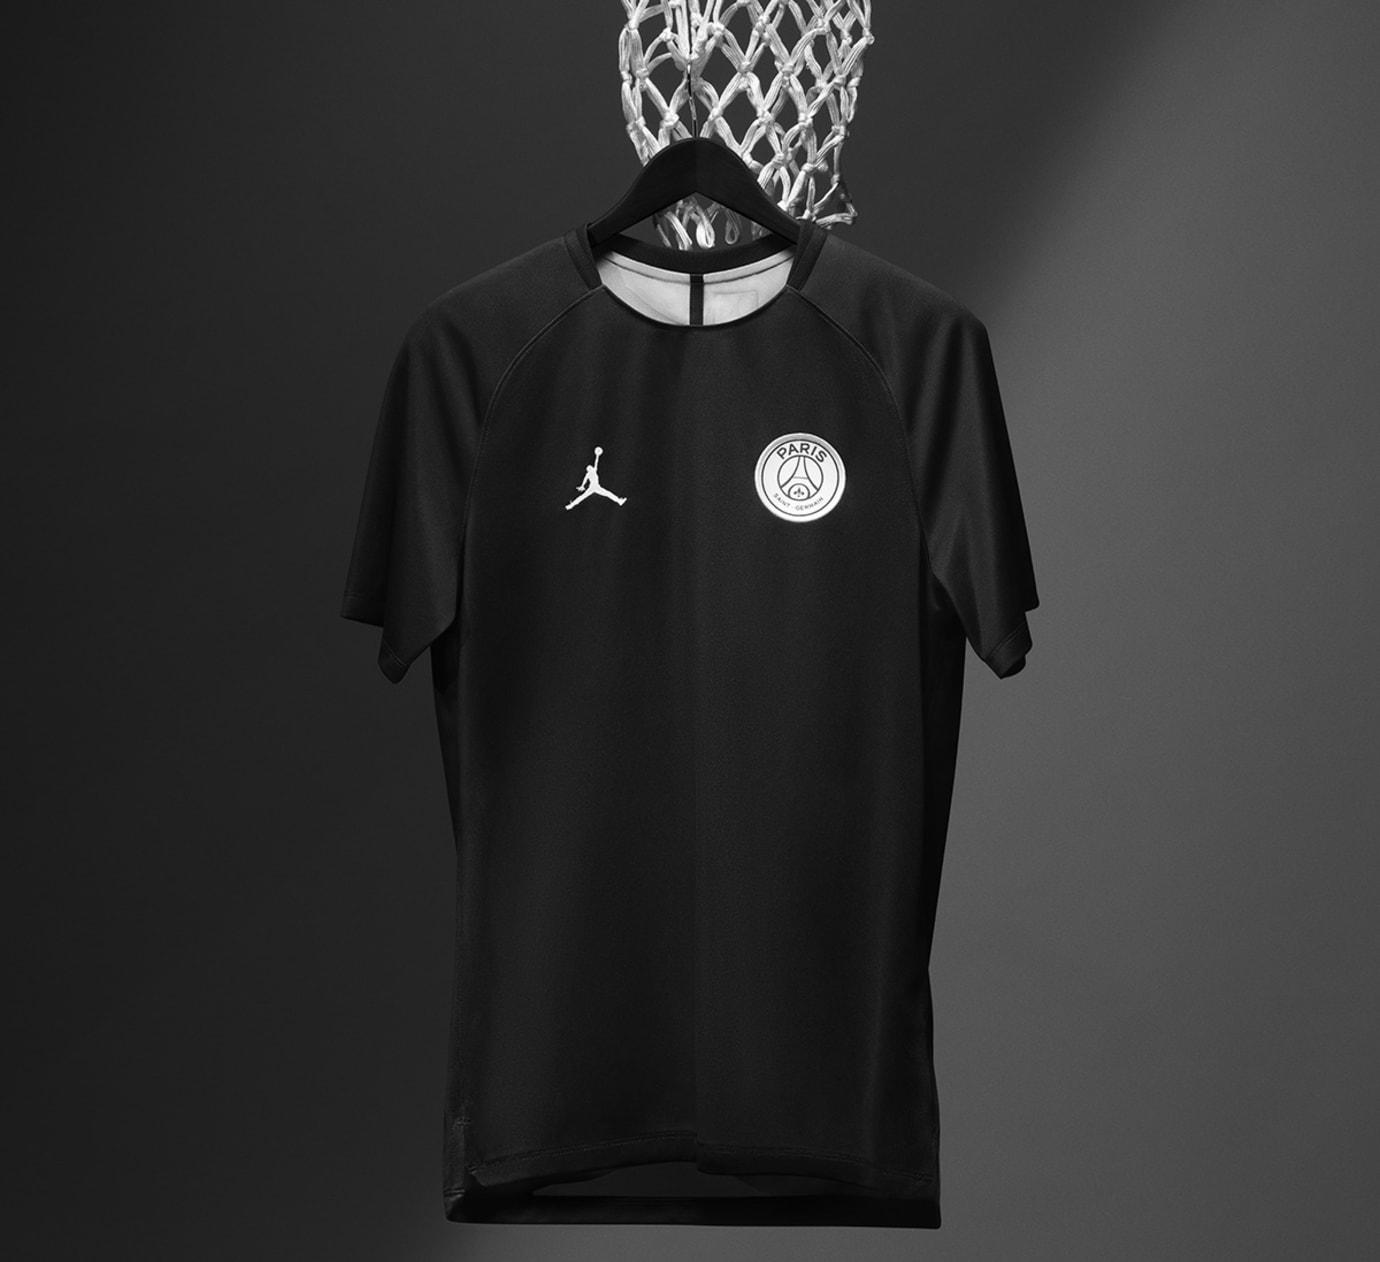 best cheap 29557 1ddb7 Paris Saint-Germain x Jordan Brand Collection | Sole Collector